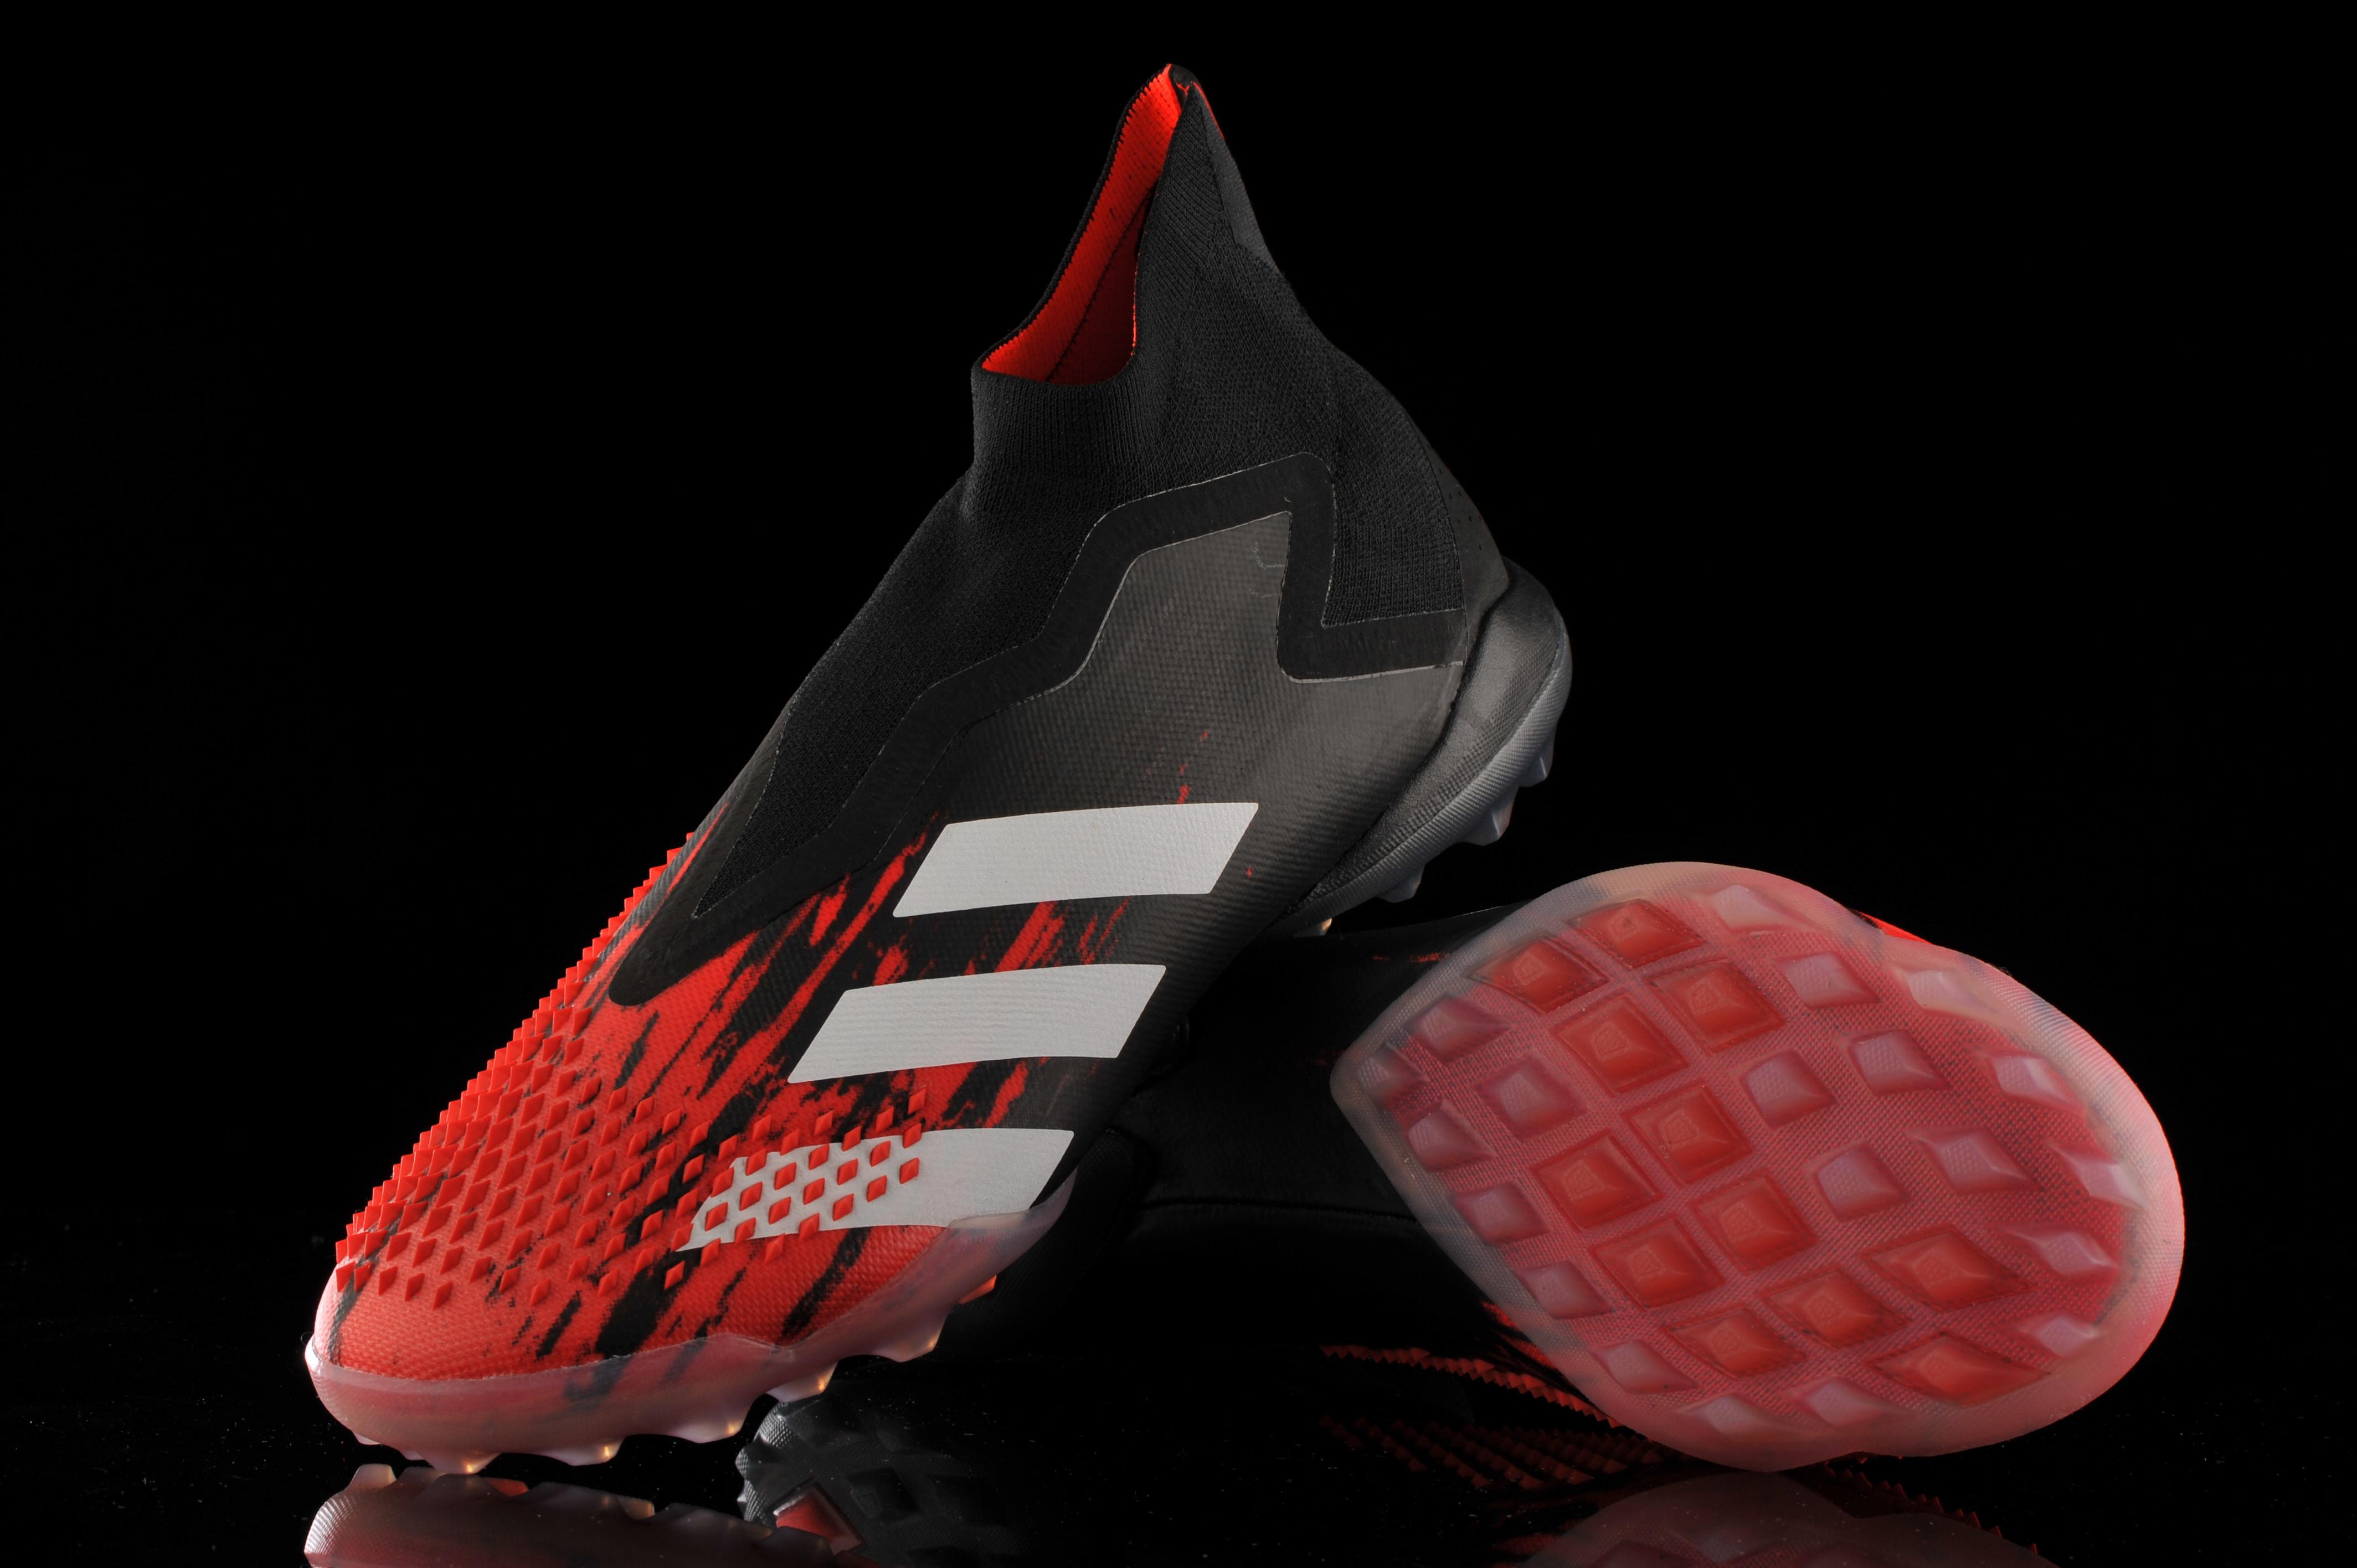 Adidas Predator 20 Pro Shin Guards Black adidas Belgium